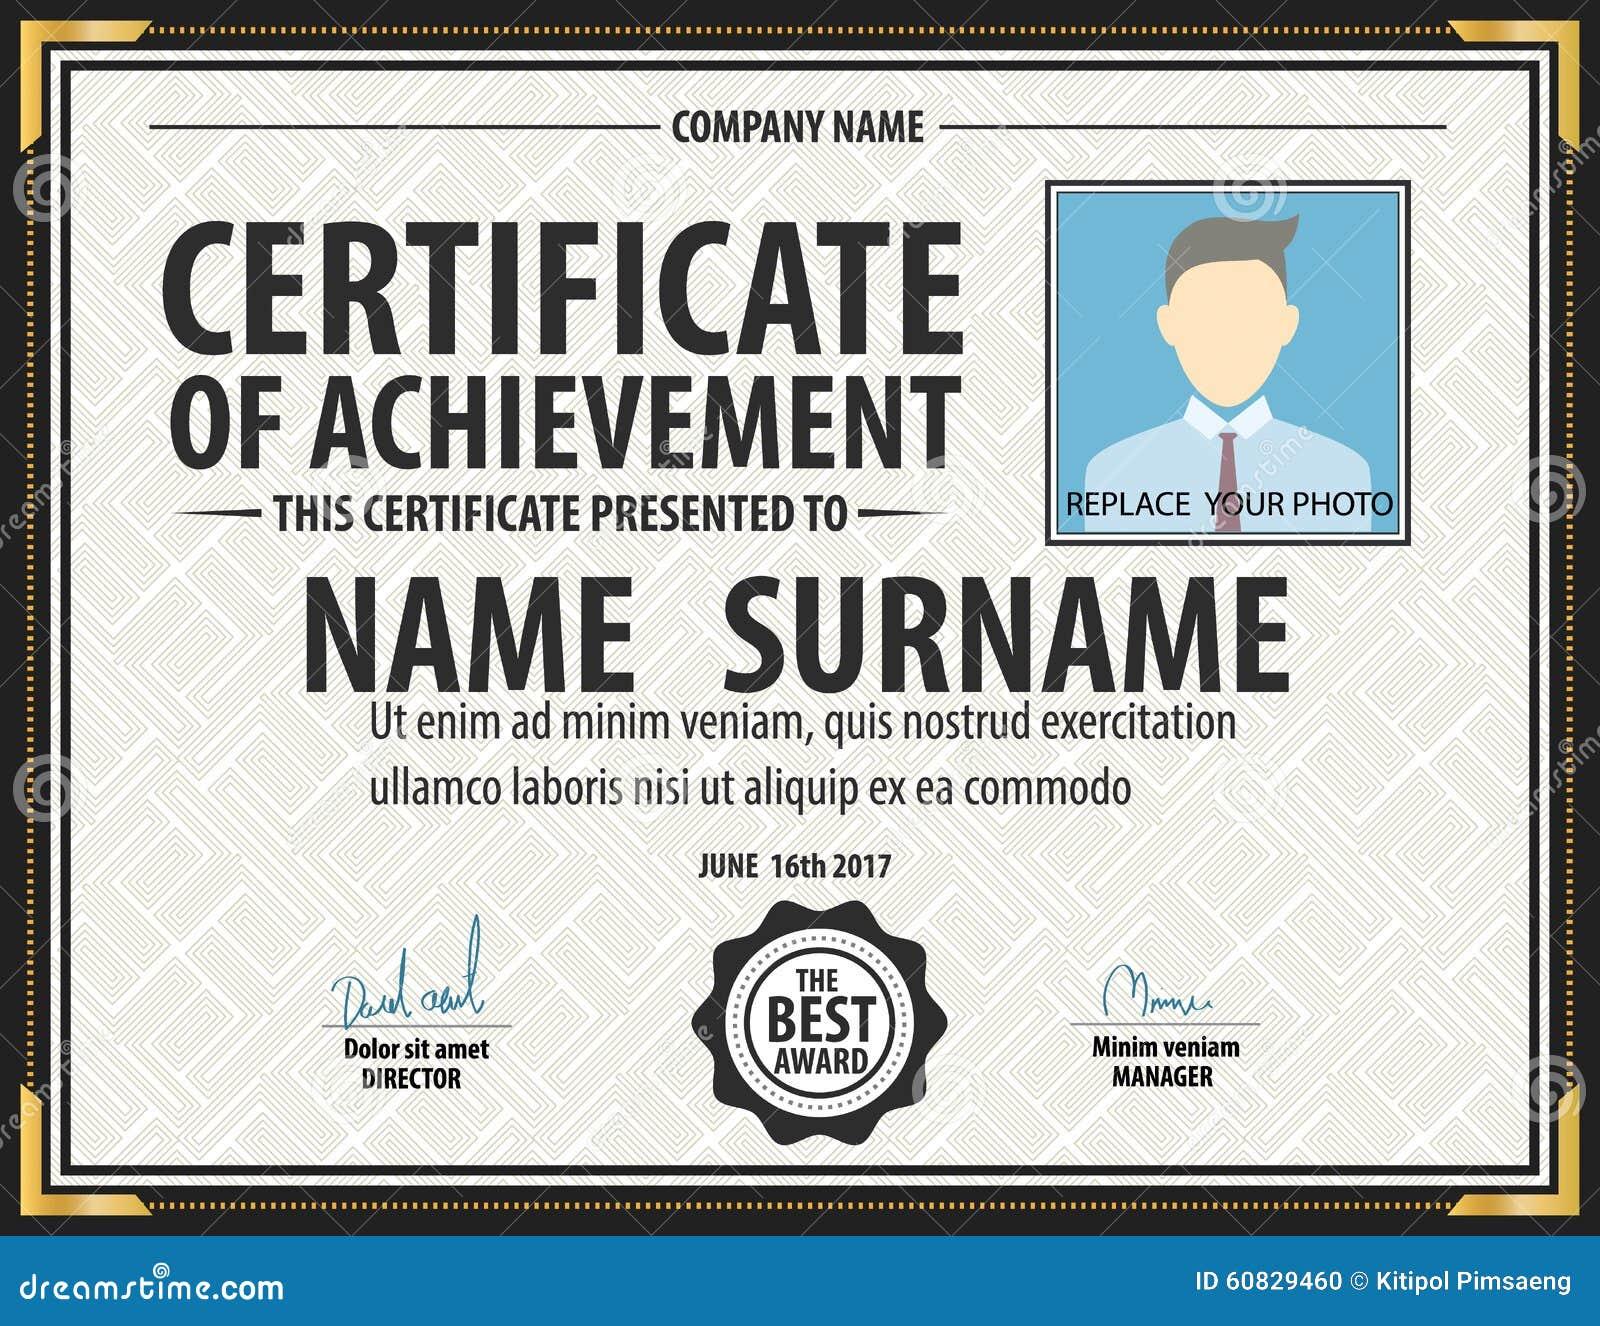 Horizontal Vintage Certificate Templatediplomaletter Size Lay